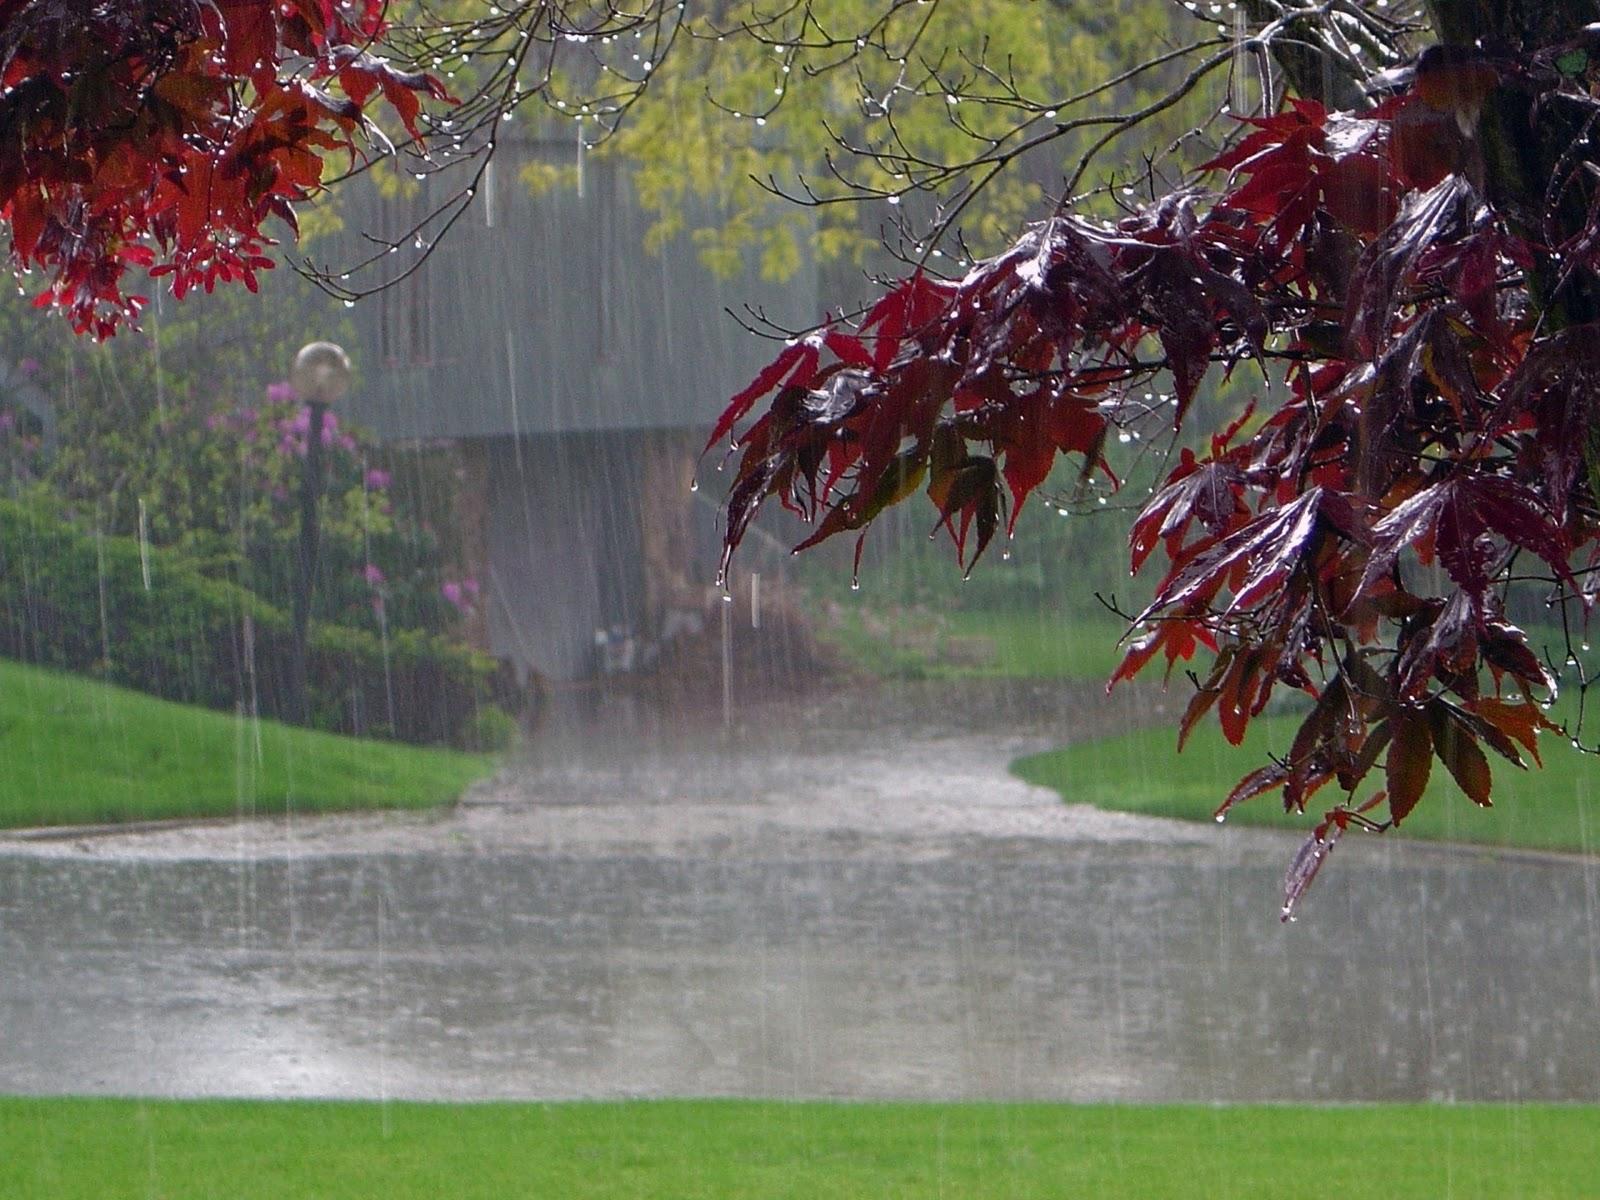 Rain hd wallpapers - Rainy nature hd wallpaper ...